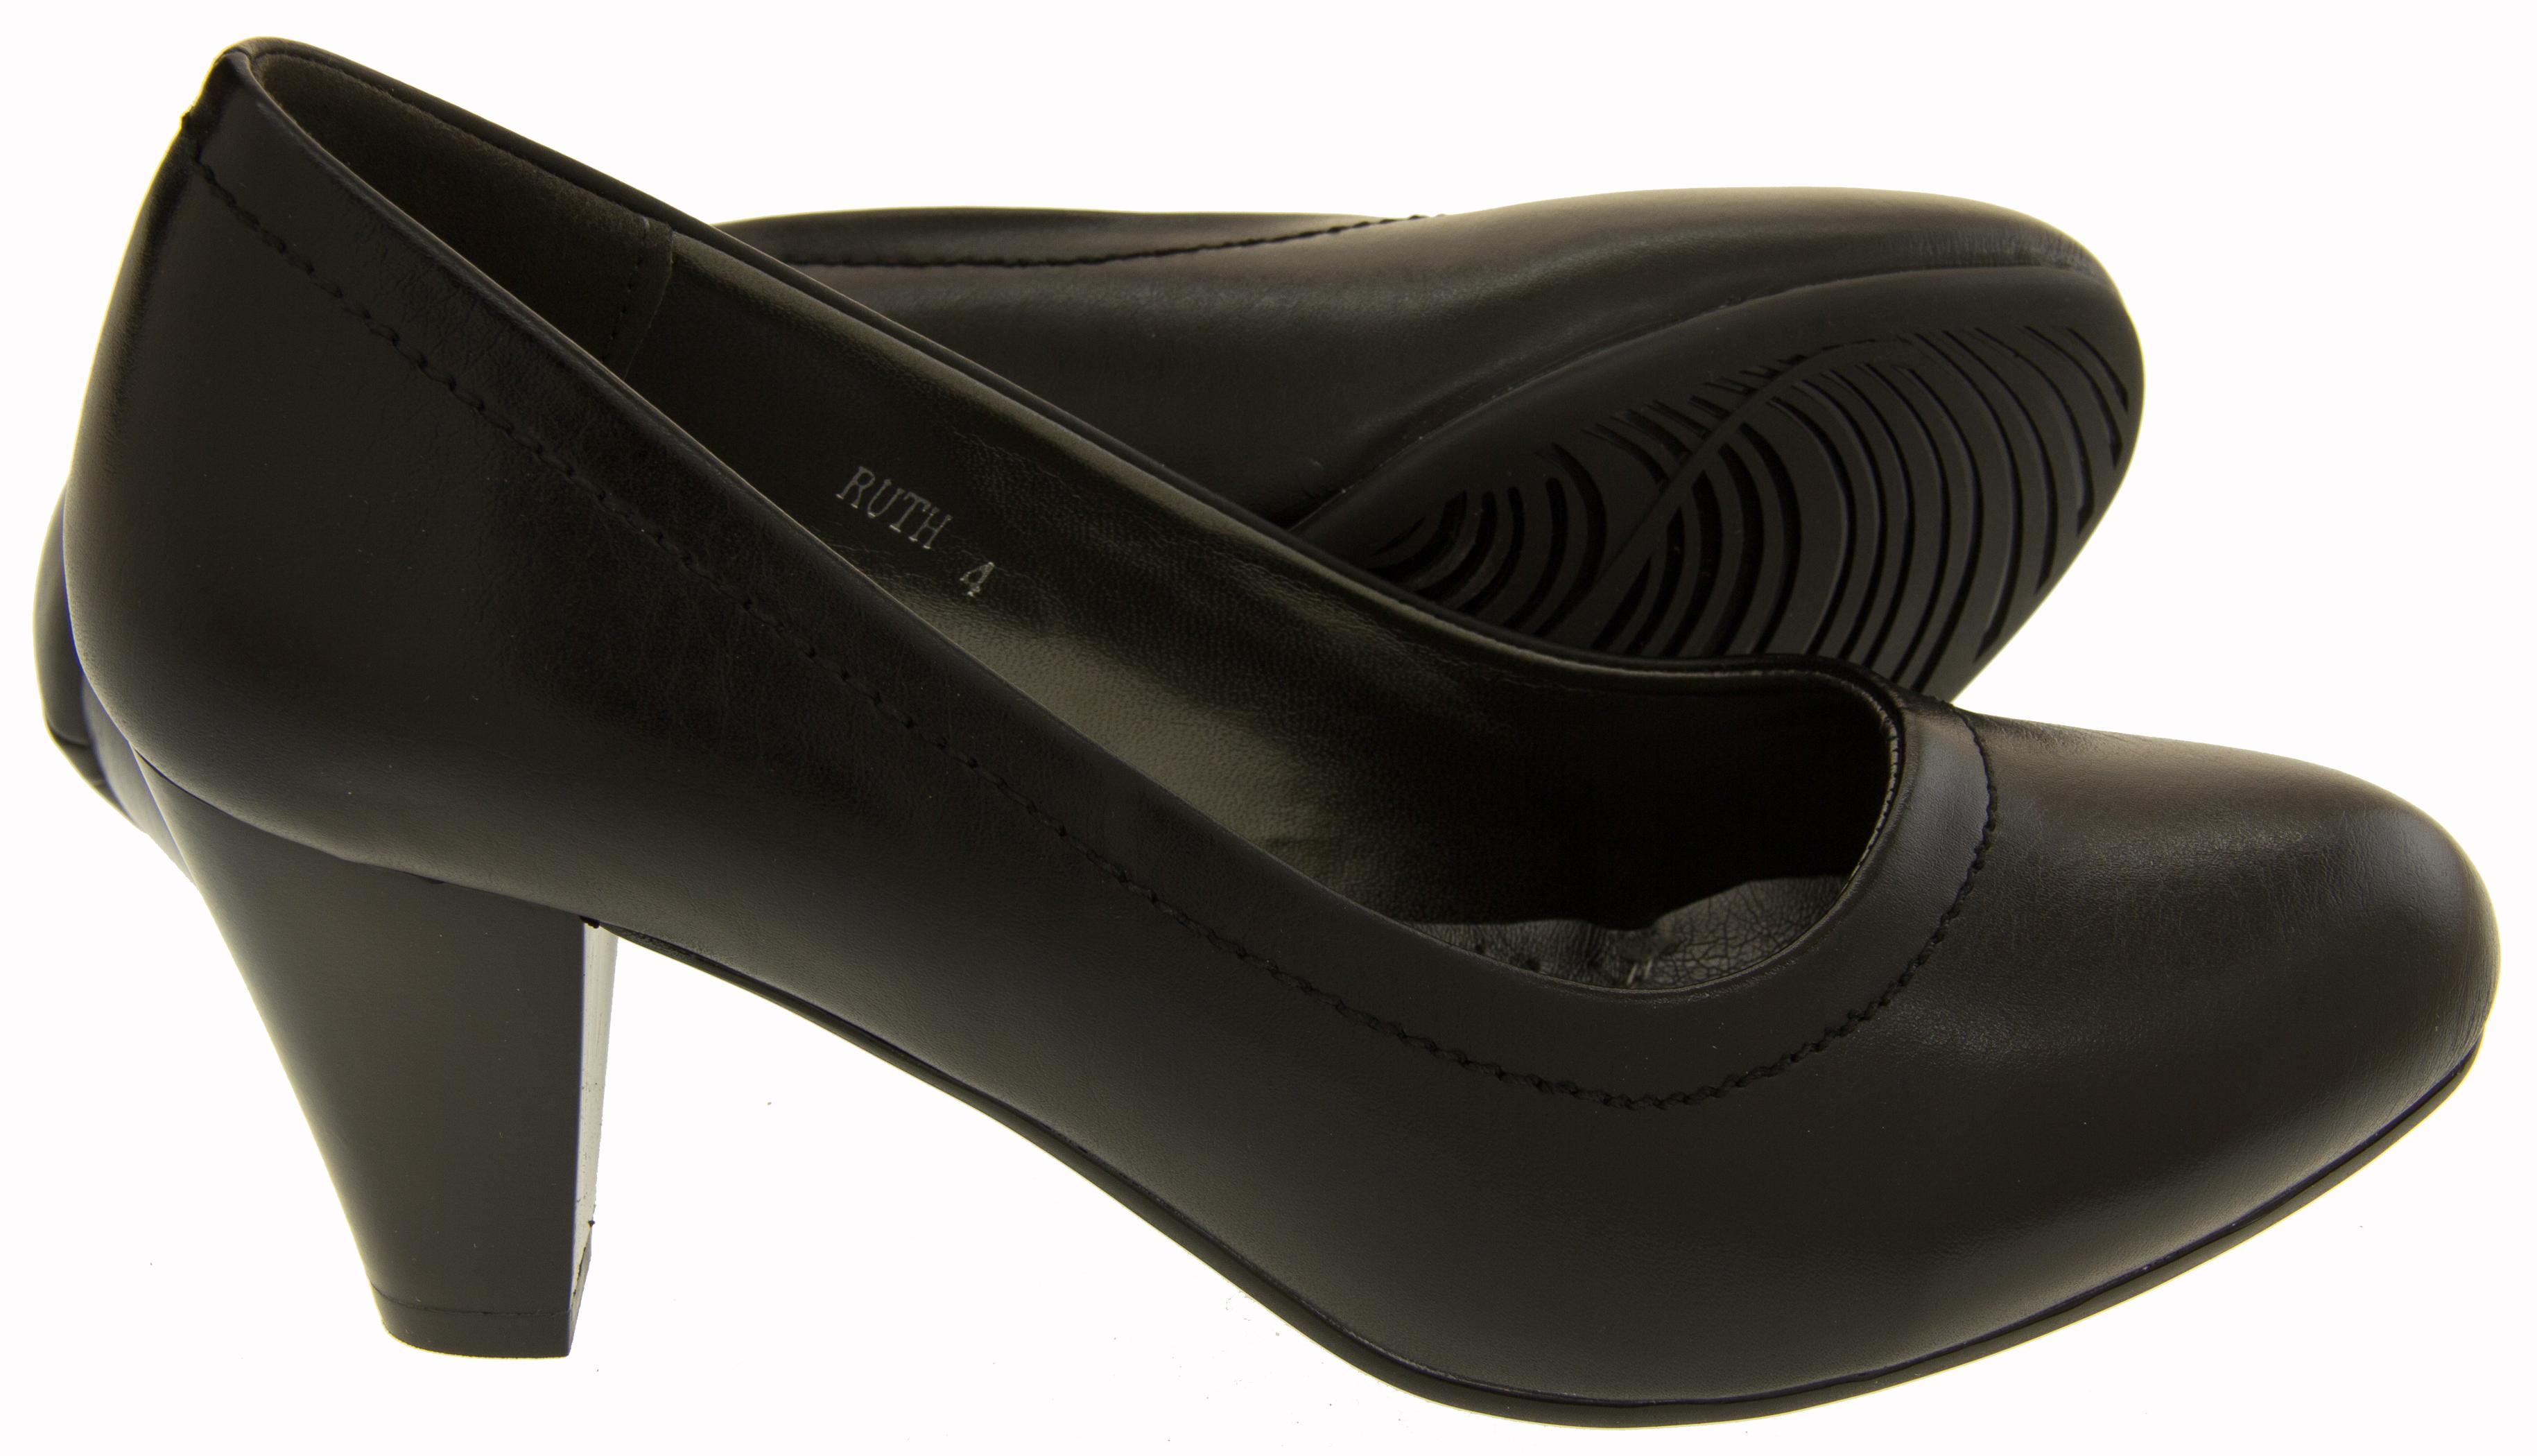 5a4a8a62bea2 Ladies Mid Heel Court Shoes Womens Smart Block Heels Shoe Sz Size 3 4 5 6